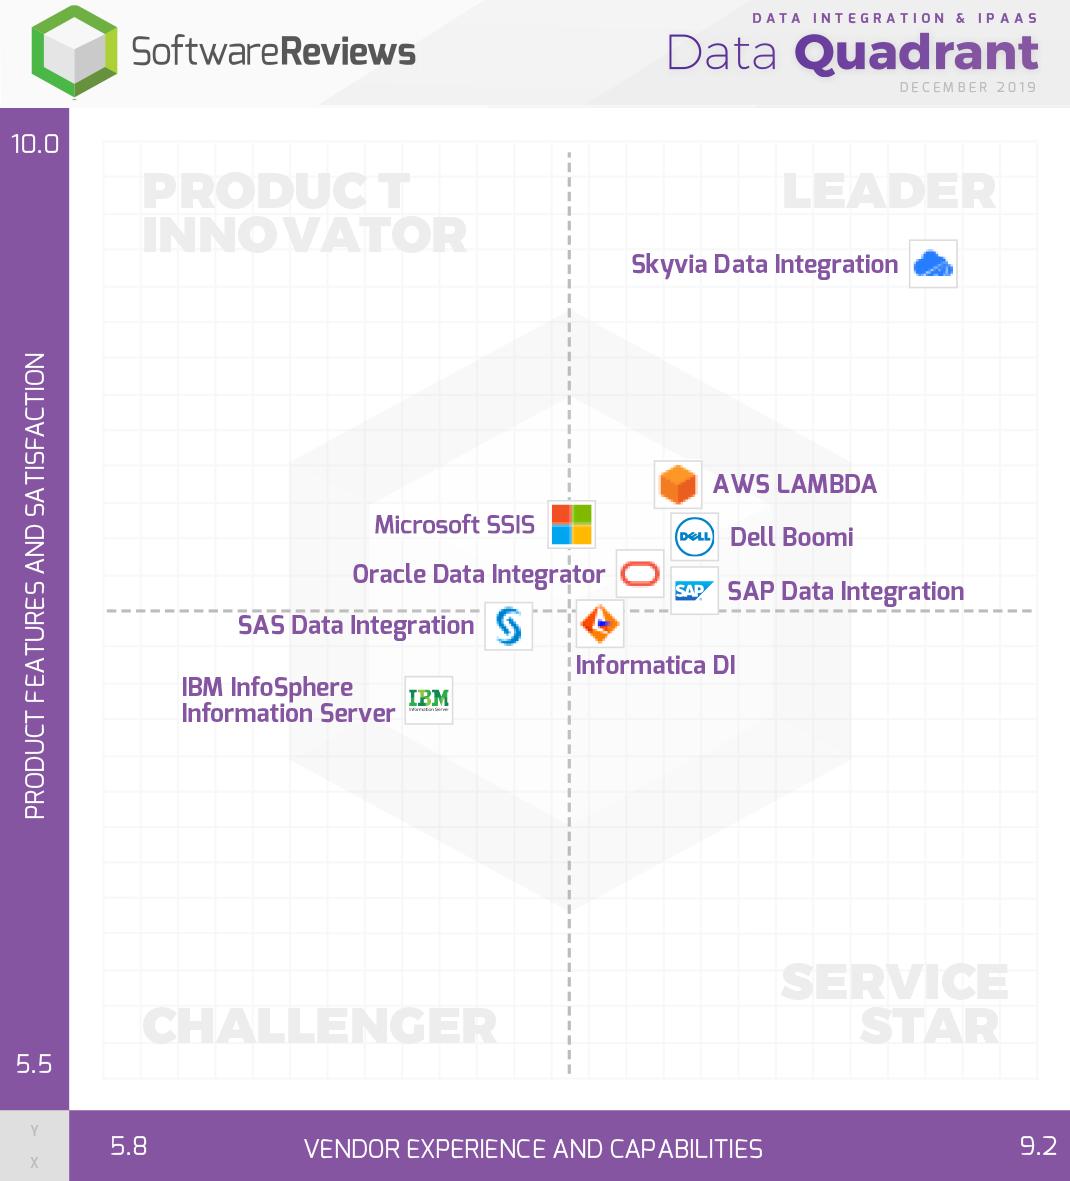 Data Integration & iPaaS Data Quadrant